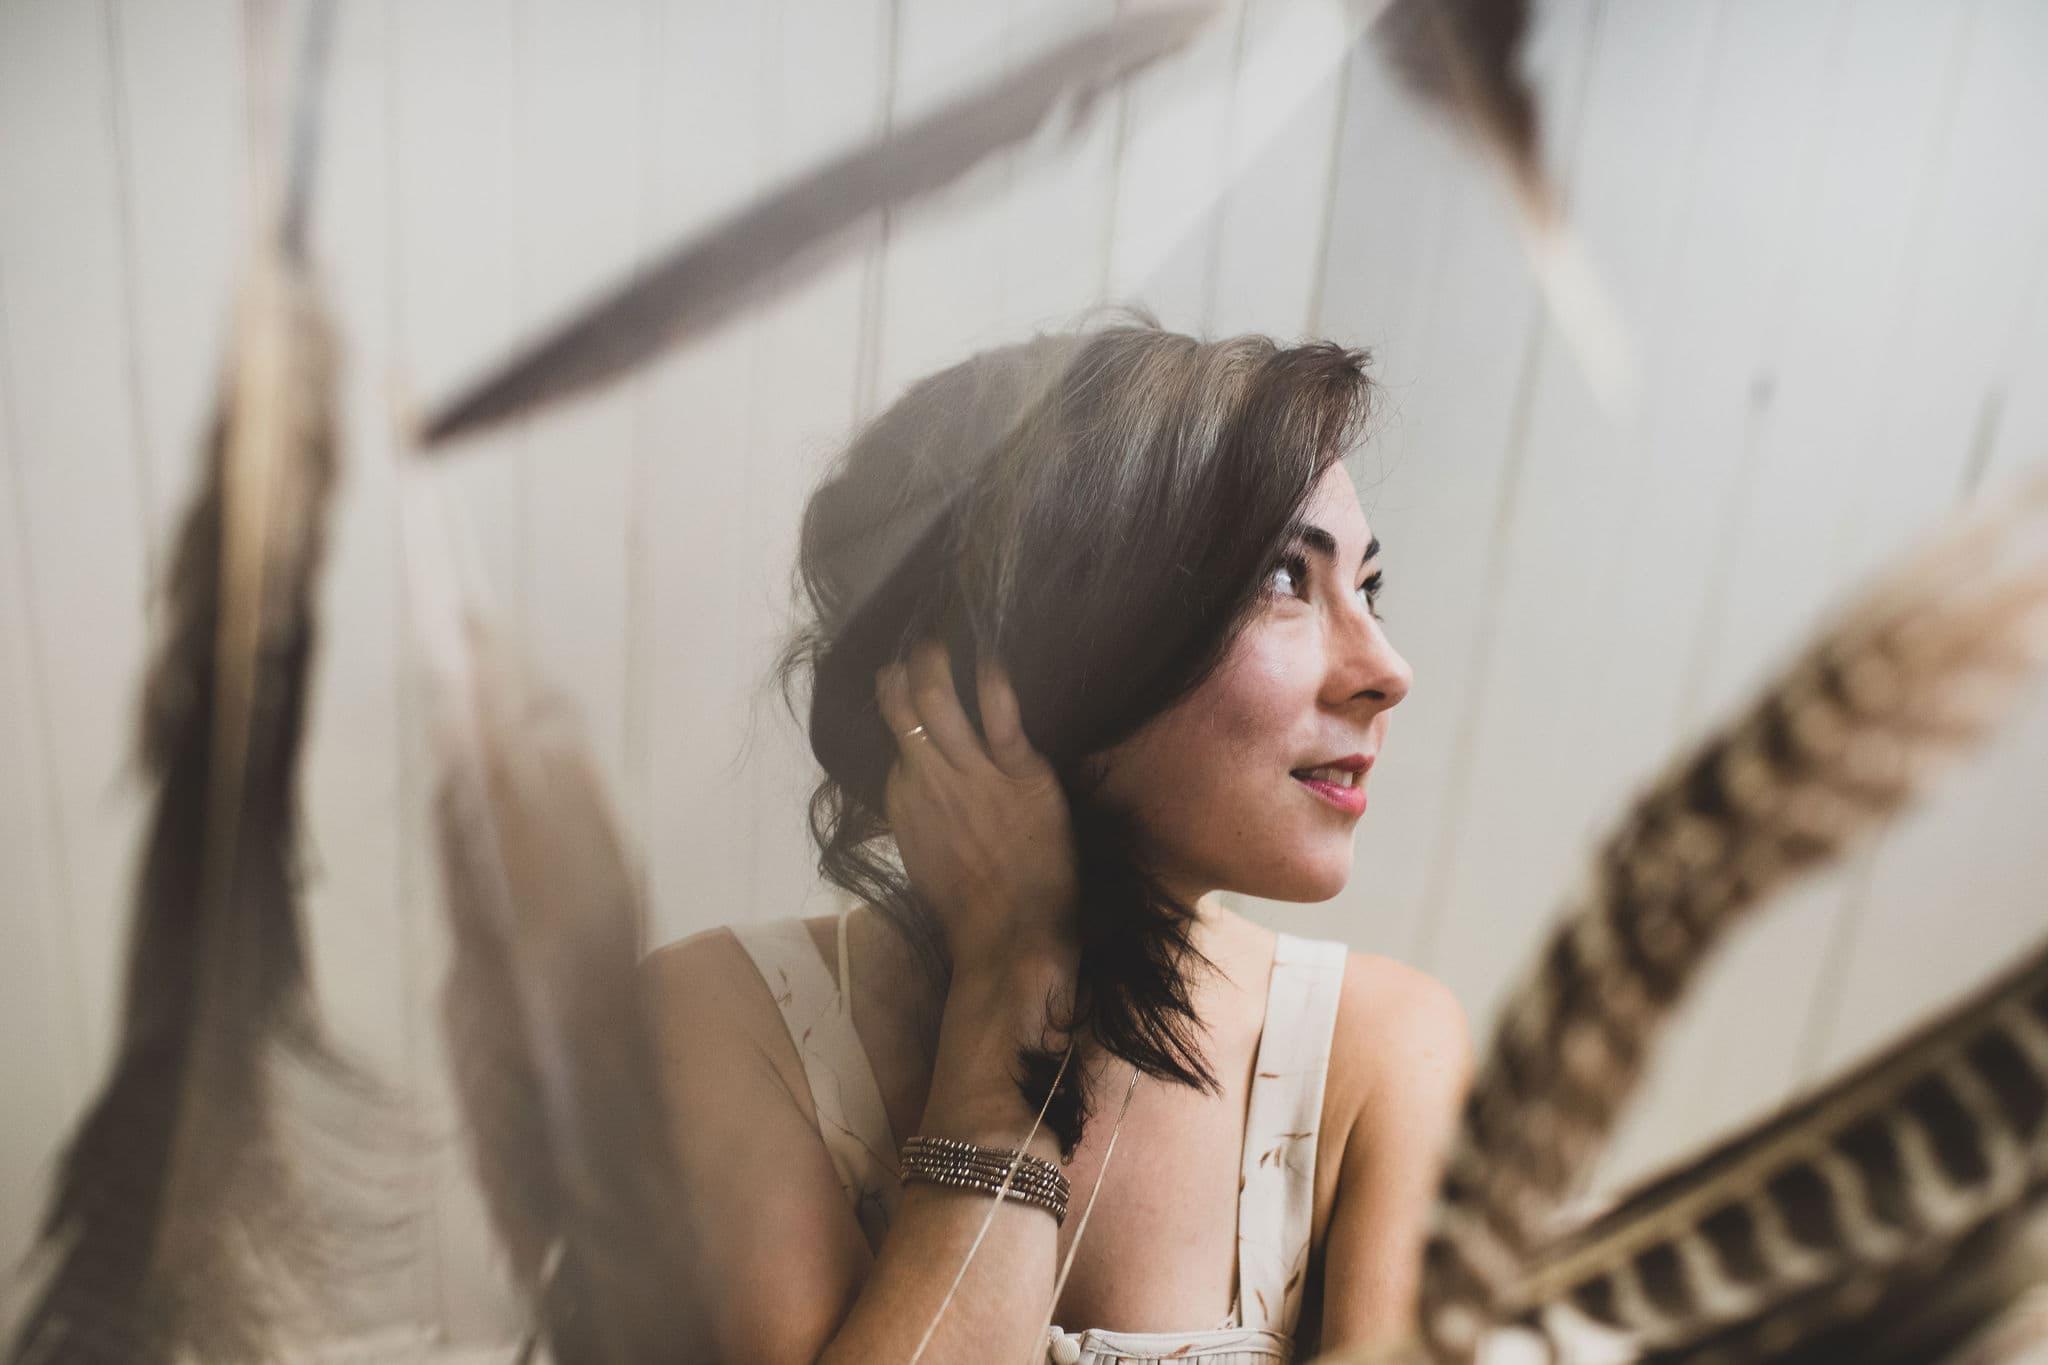 Massachusetts singer-songwriter Heather Maloney (courtesy Carly Rae)